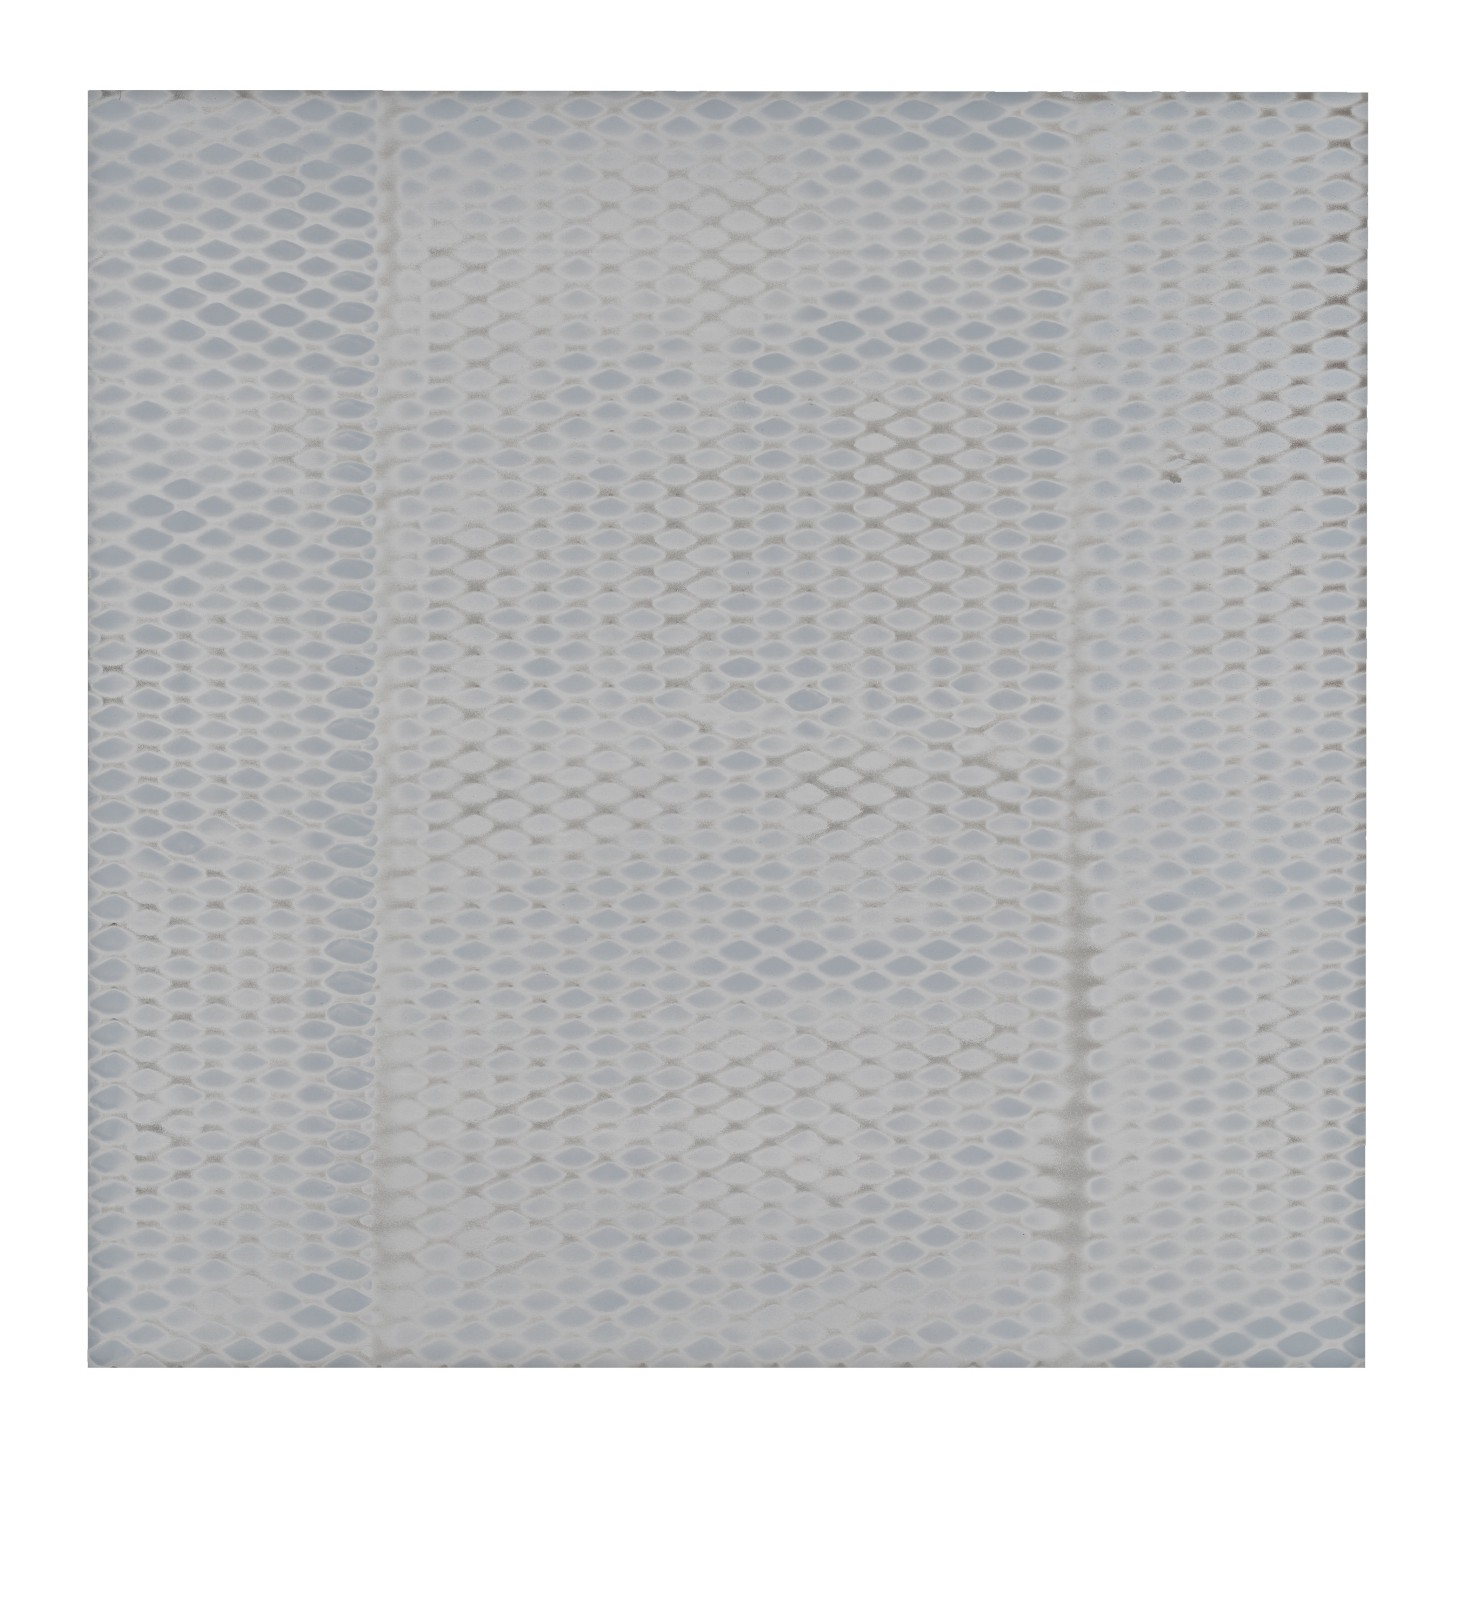 "STAIN : 55°35'54.5""N 13°01'54.9""E, 2016, spraypaint on aluminium, 81,3 x 81,3 cm"